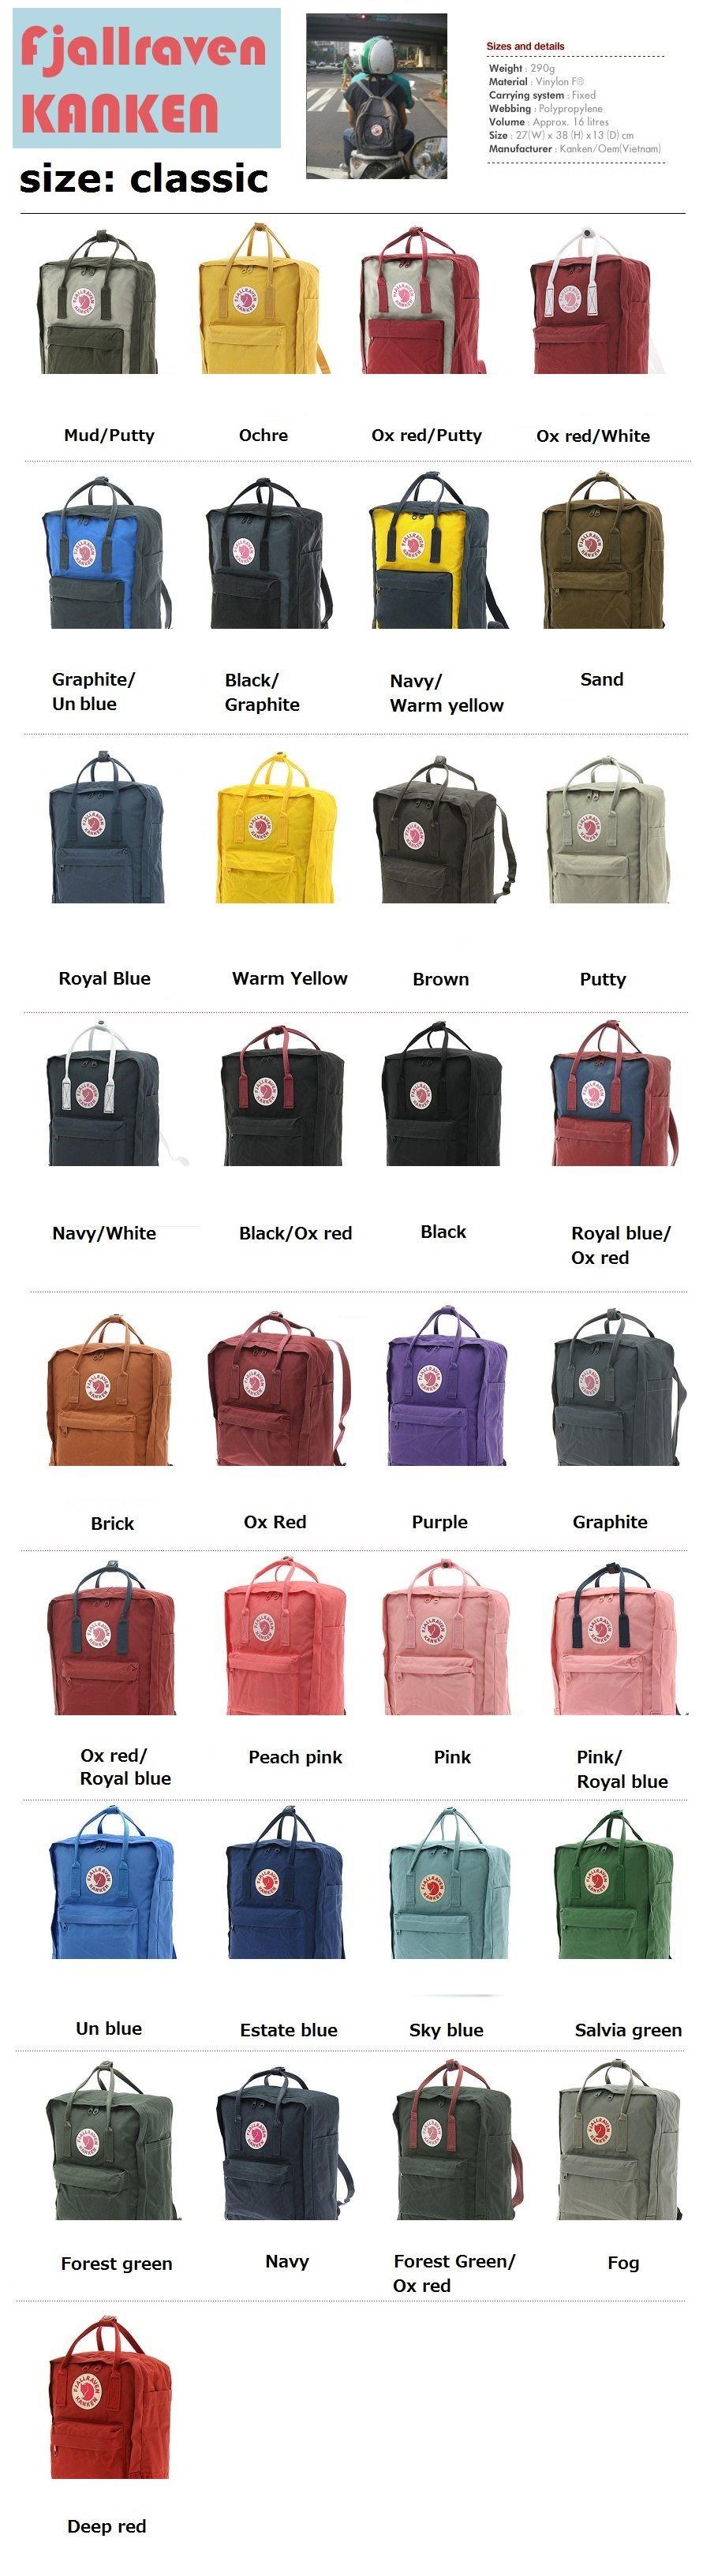 Buy Kconcept? FJALLRAVEN Kanken Authentic Steady Seller Kanken Bag! Kanken  classic backpack SALE PRICE!!two tone colors 30 colors!! New color